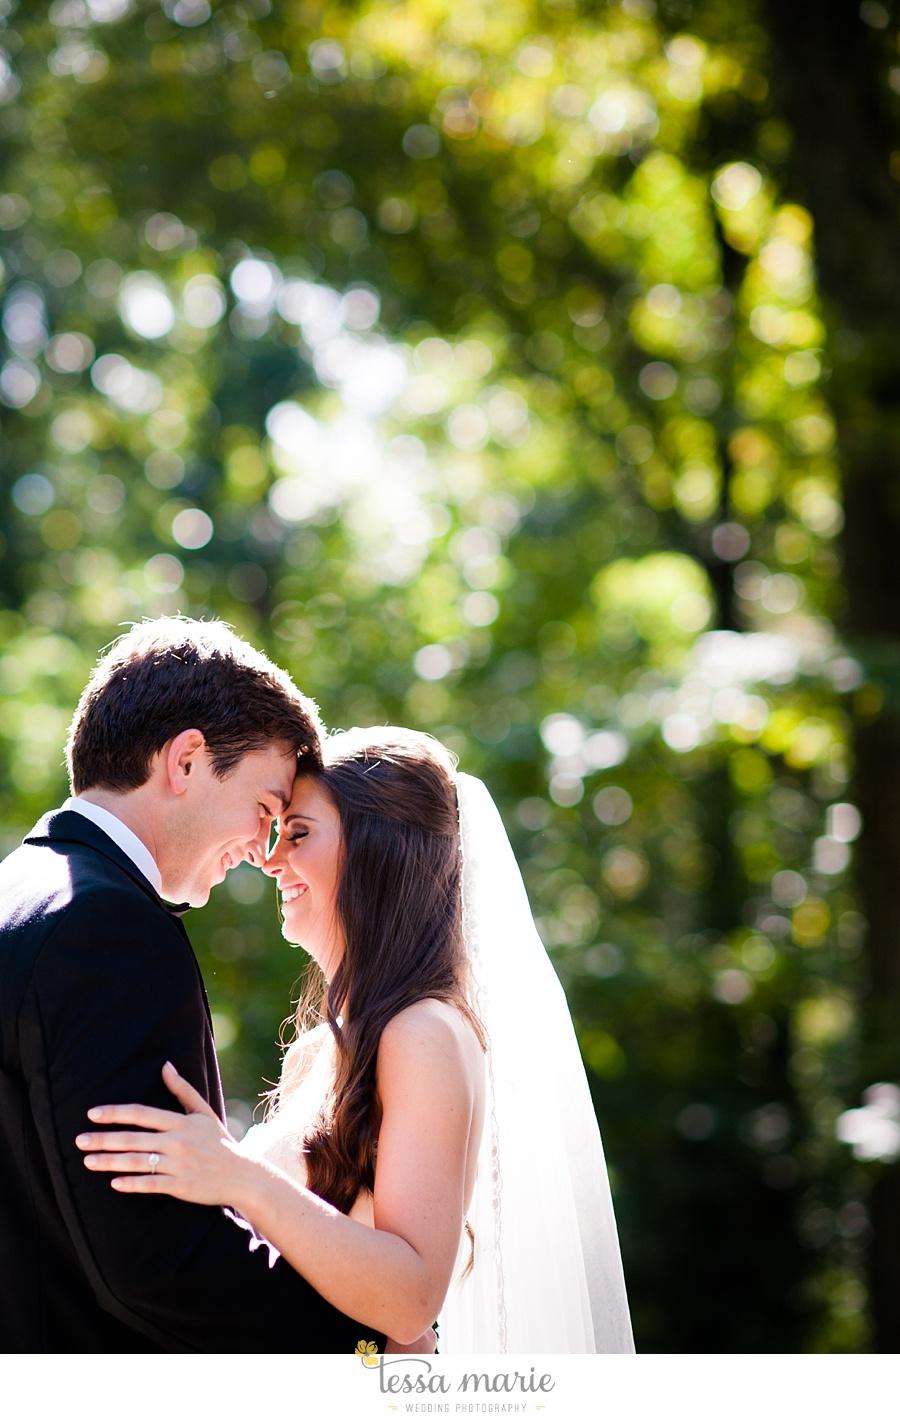 outdoor_wedding_pictures_marietta_sweethearts_candid_emotional_tessa_marie_weddings_0073